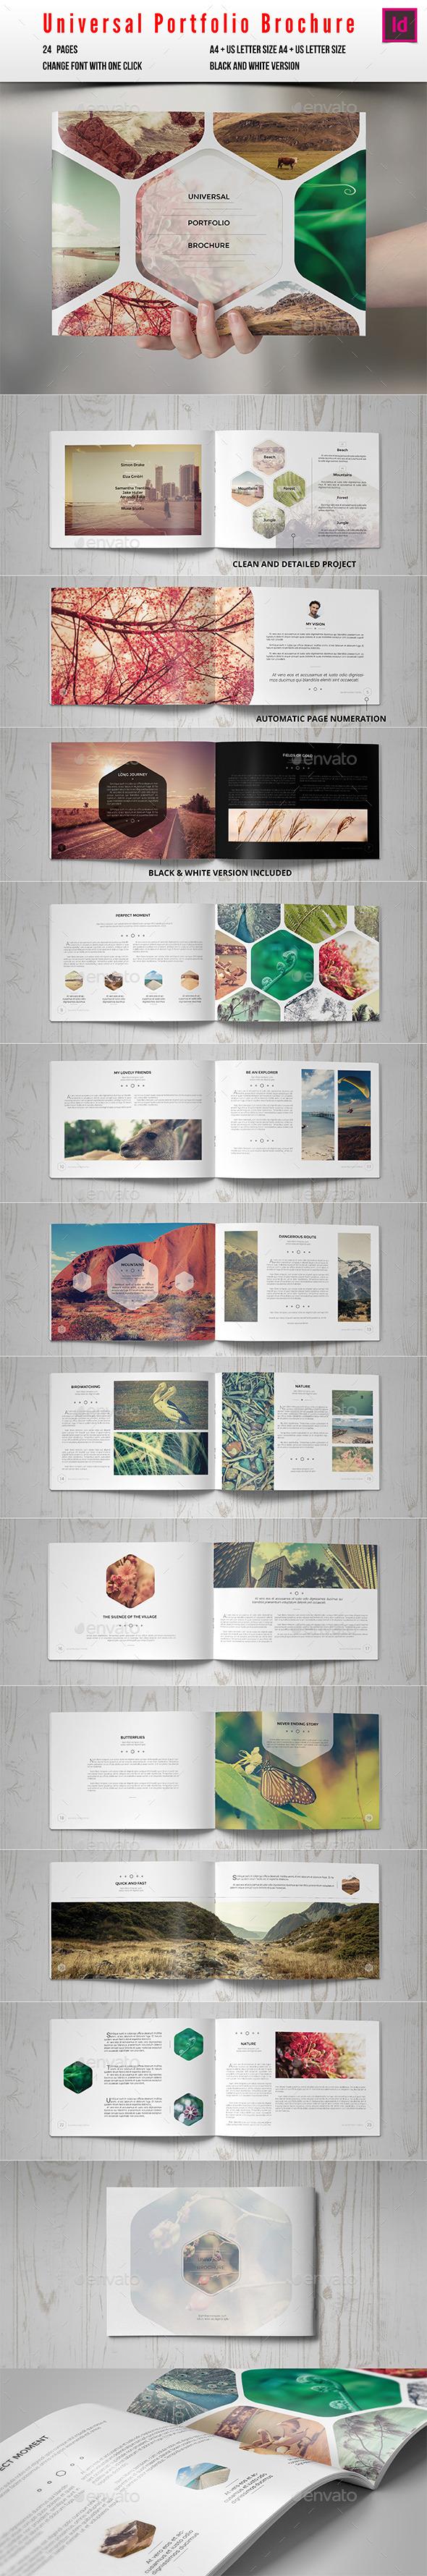 Universal Portfolio Brochure / Catalog - Photo Albums Print Templates